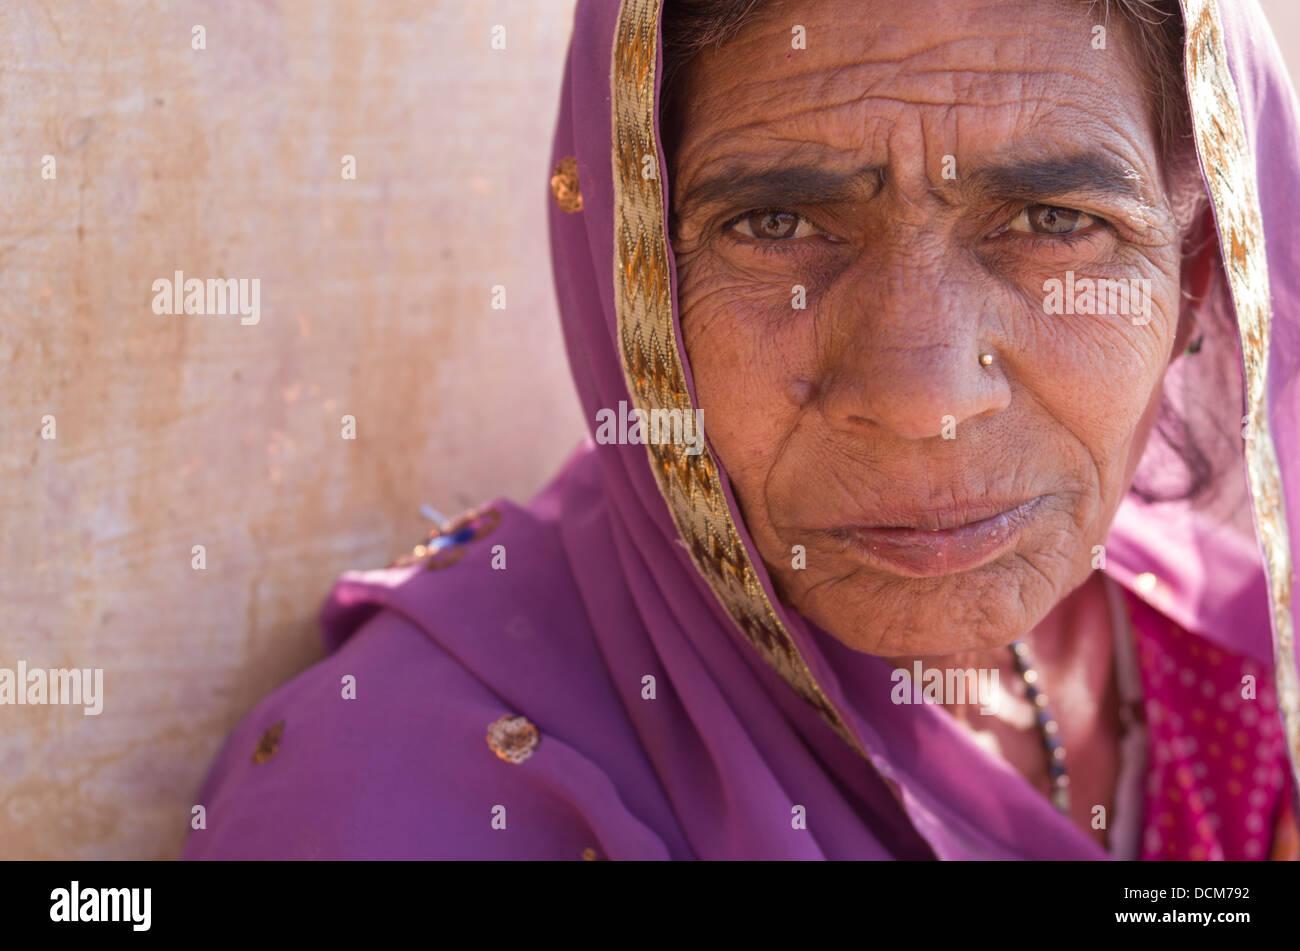 Elderly Indian woman in purple sari at the Amber ( Amer ) Fort / Palace - Jaipur, Rajasthan, India - Stock Image